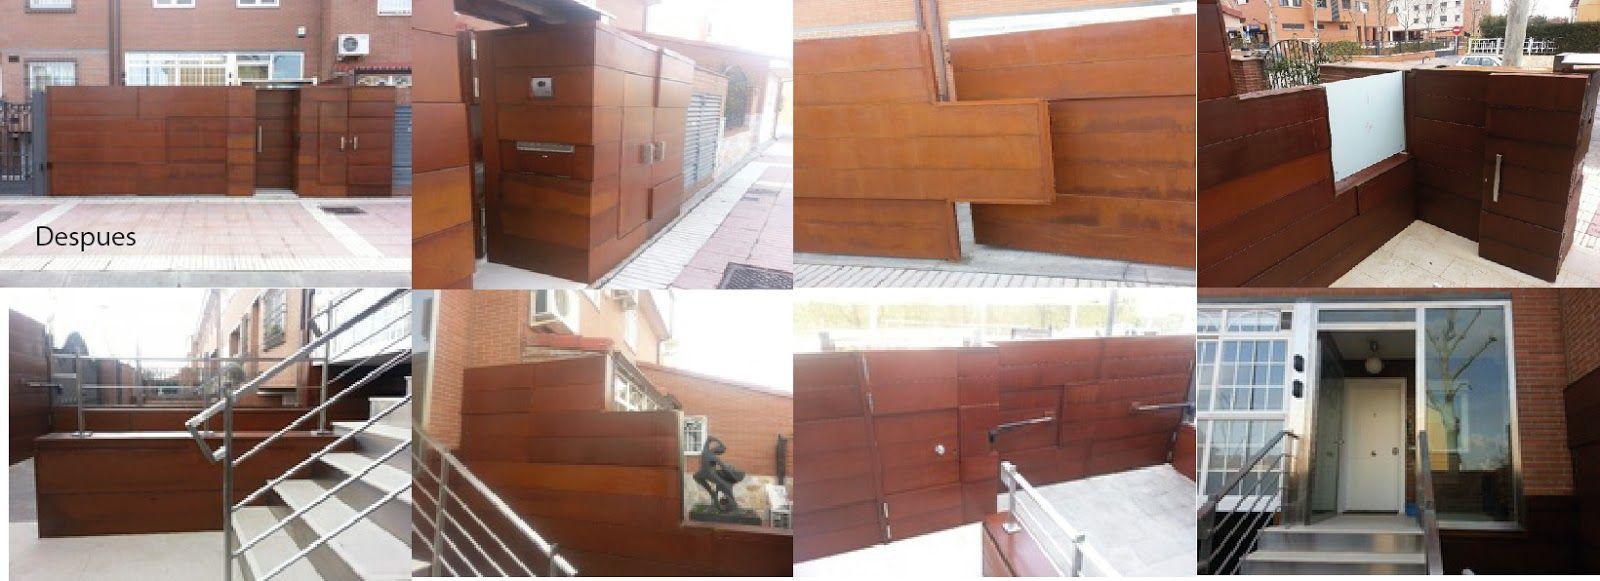 Fachadas acero corten galera courtesy of hvp la eleccin - Acero corten fachadas ...